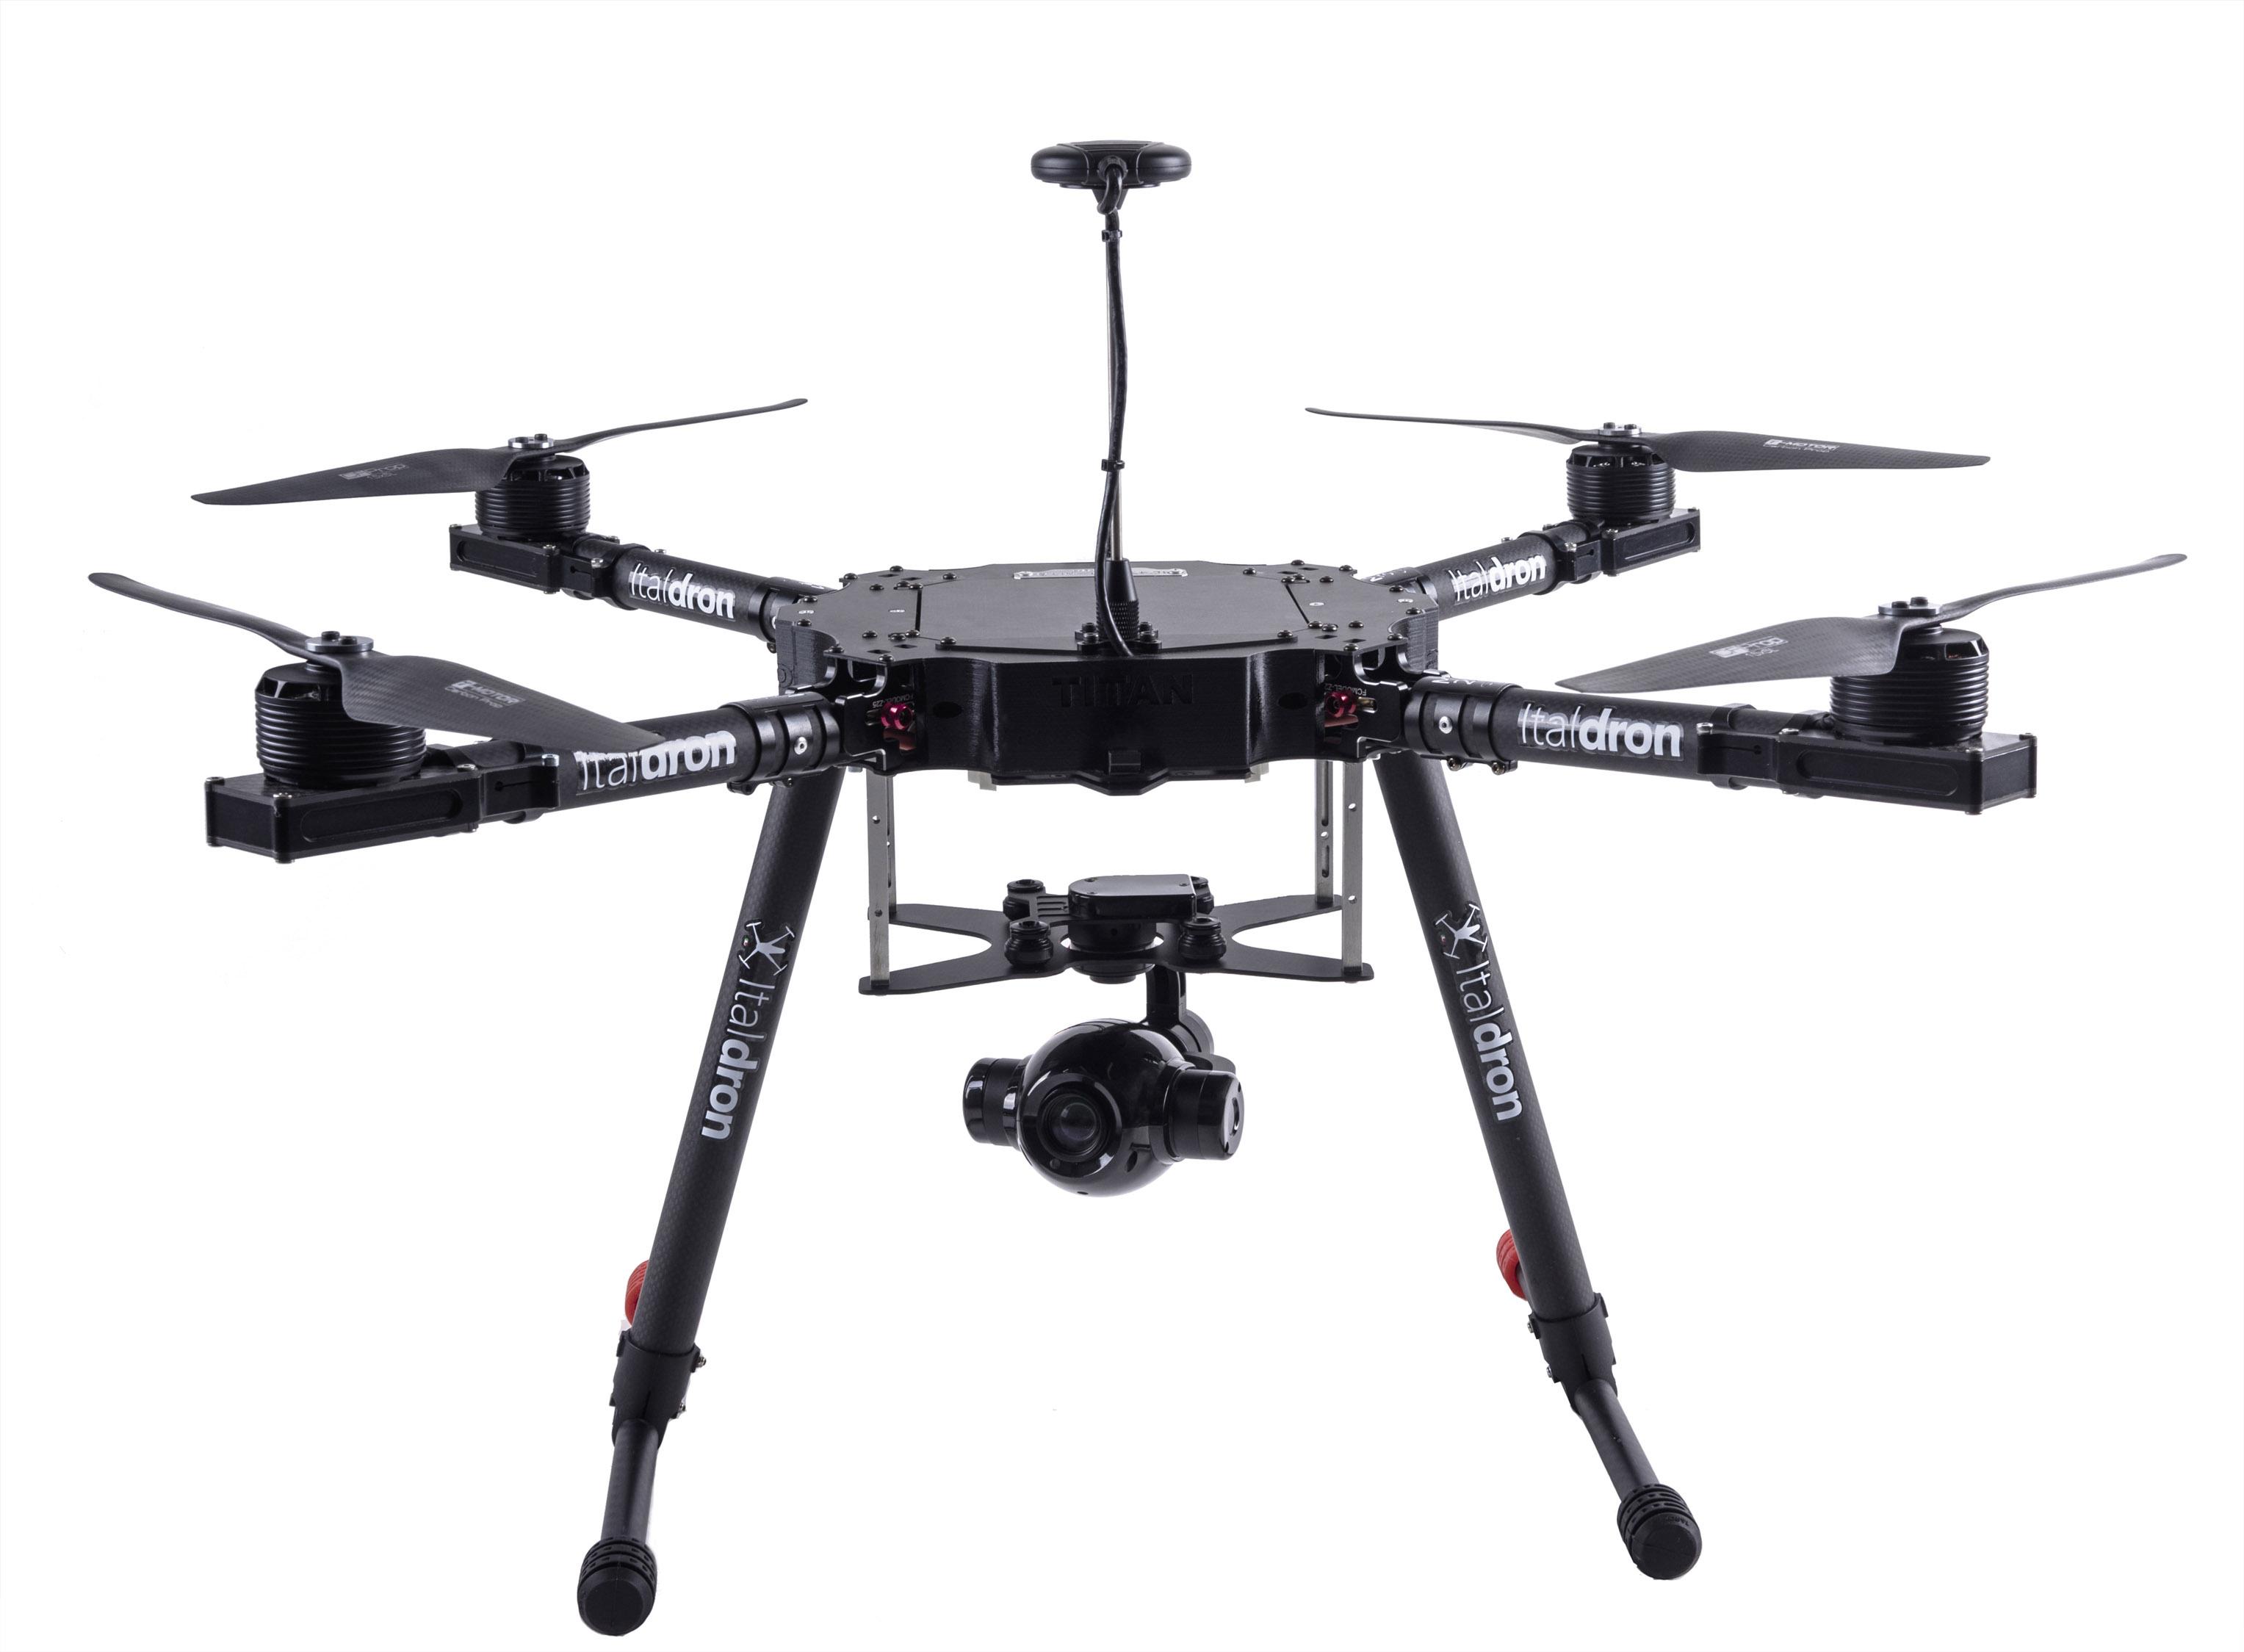 Italdron professional drone titan 4hse